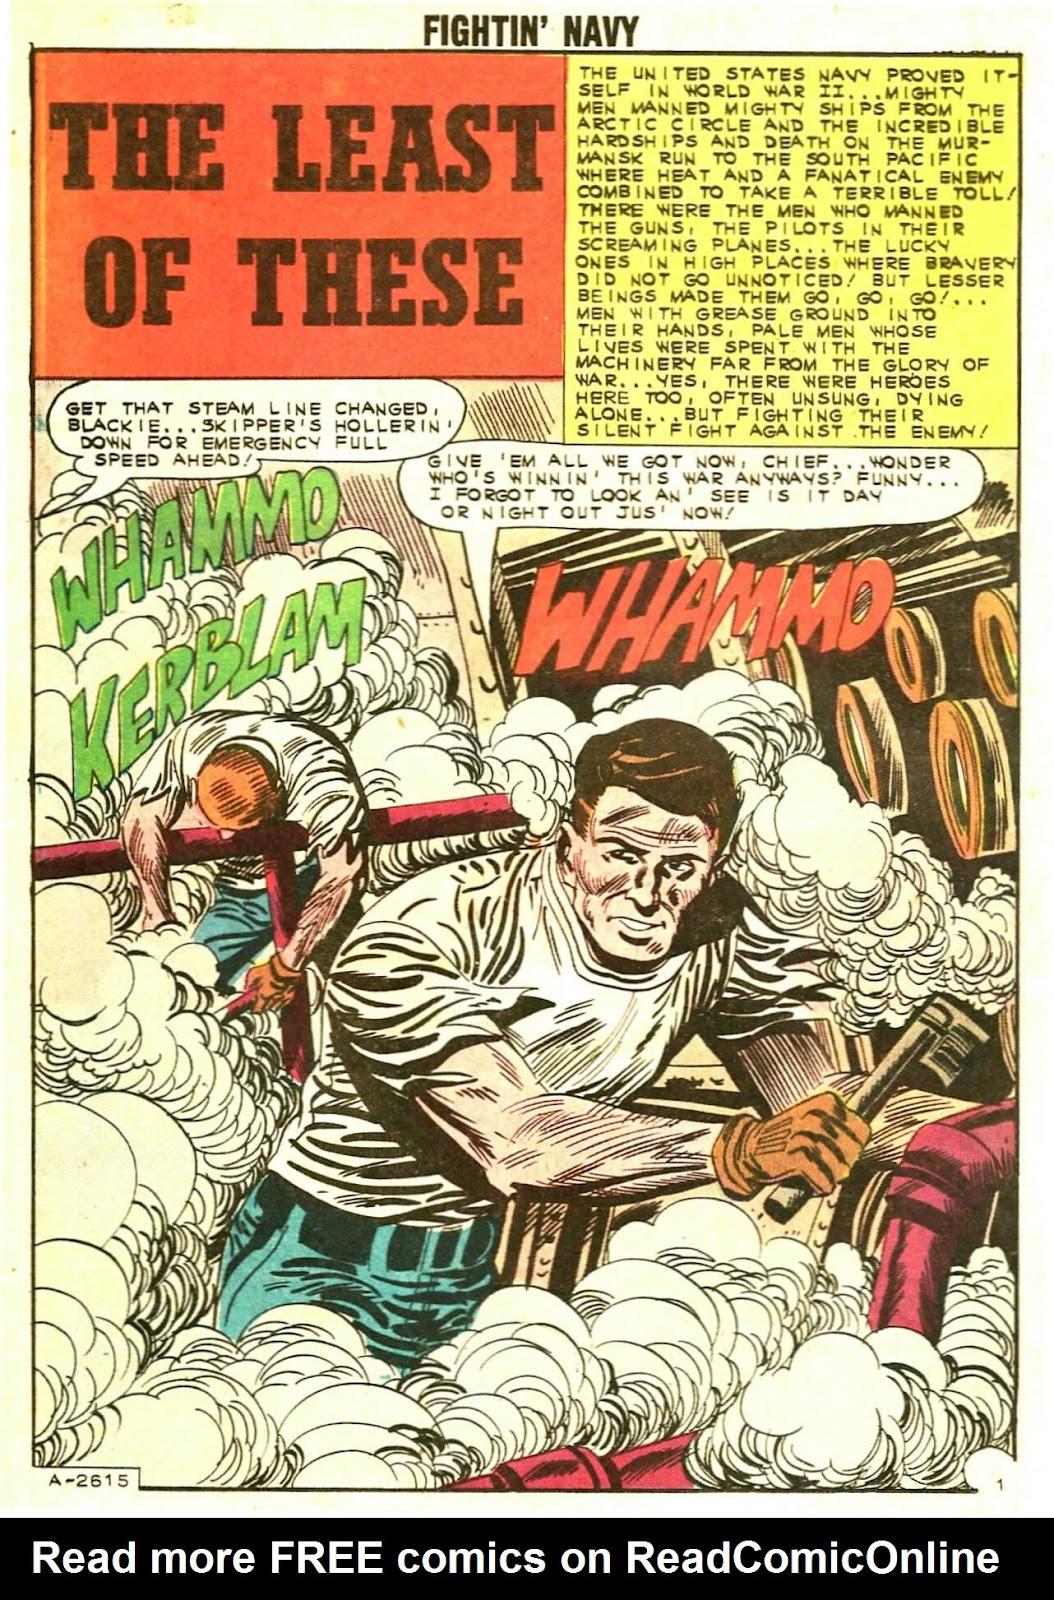 Read online Fightin' Navy comic -  Issue #110 - 16